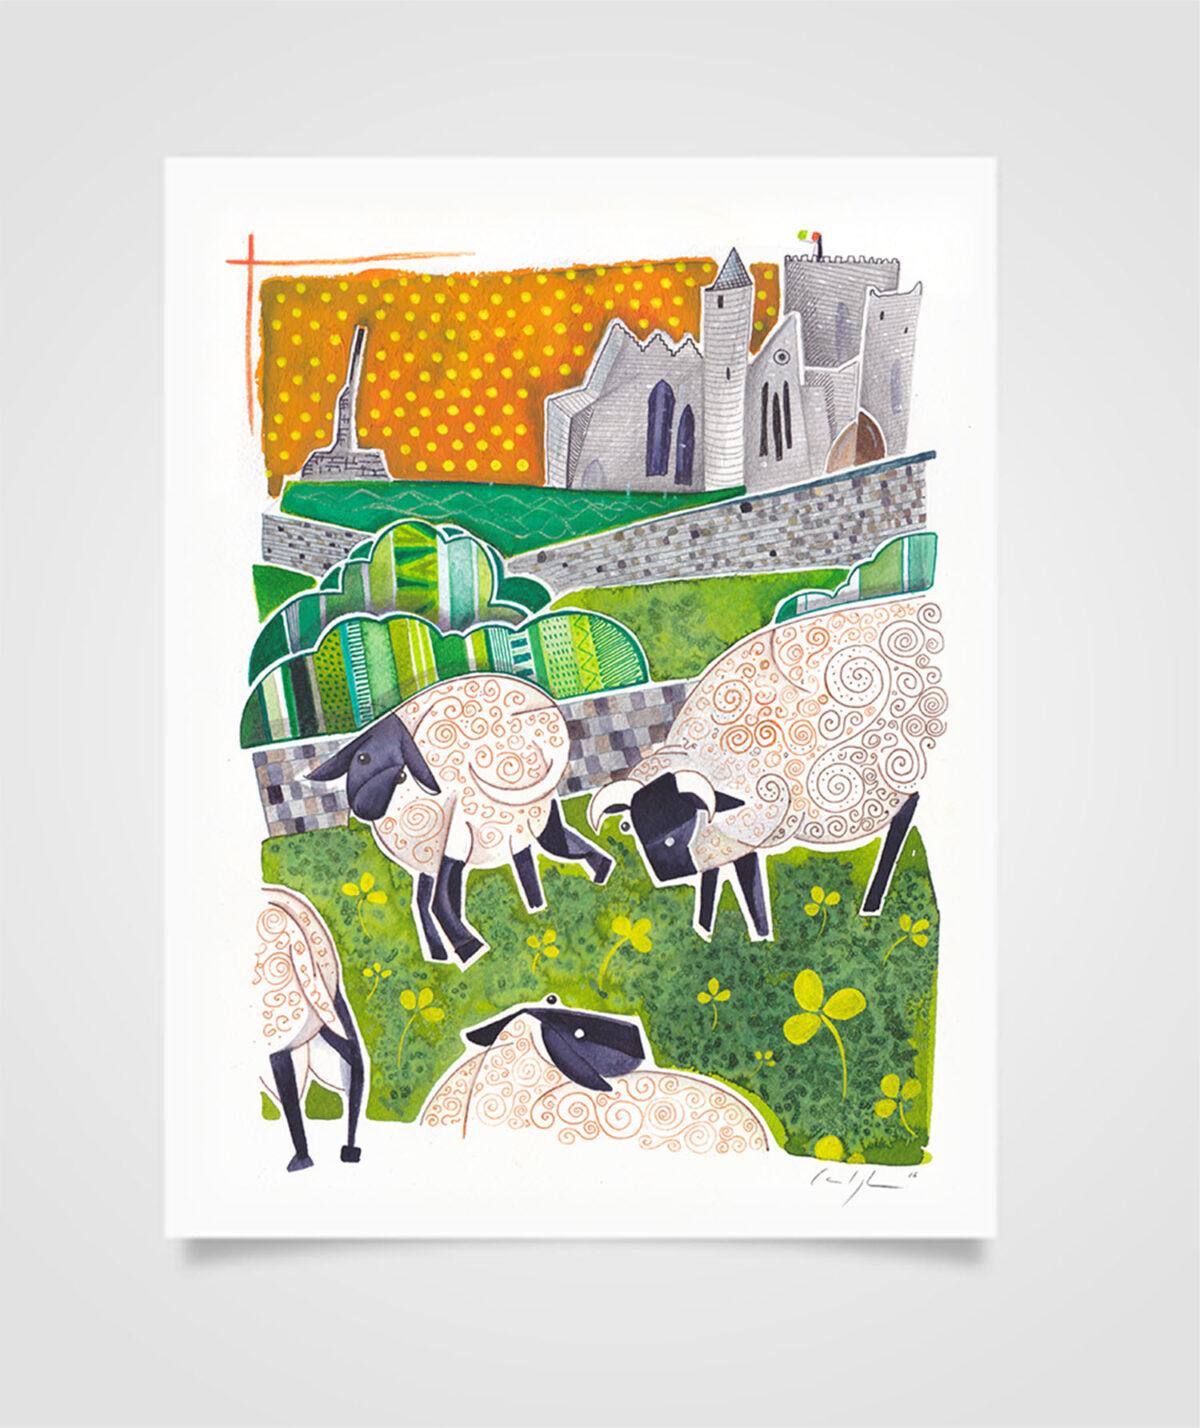 """Eire - Kilkenny Castle"" Tecniche miste su carta, 21 x 29,7 cm (2016)"